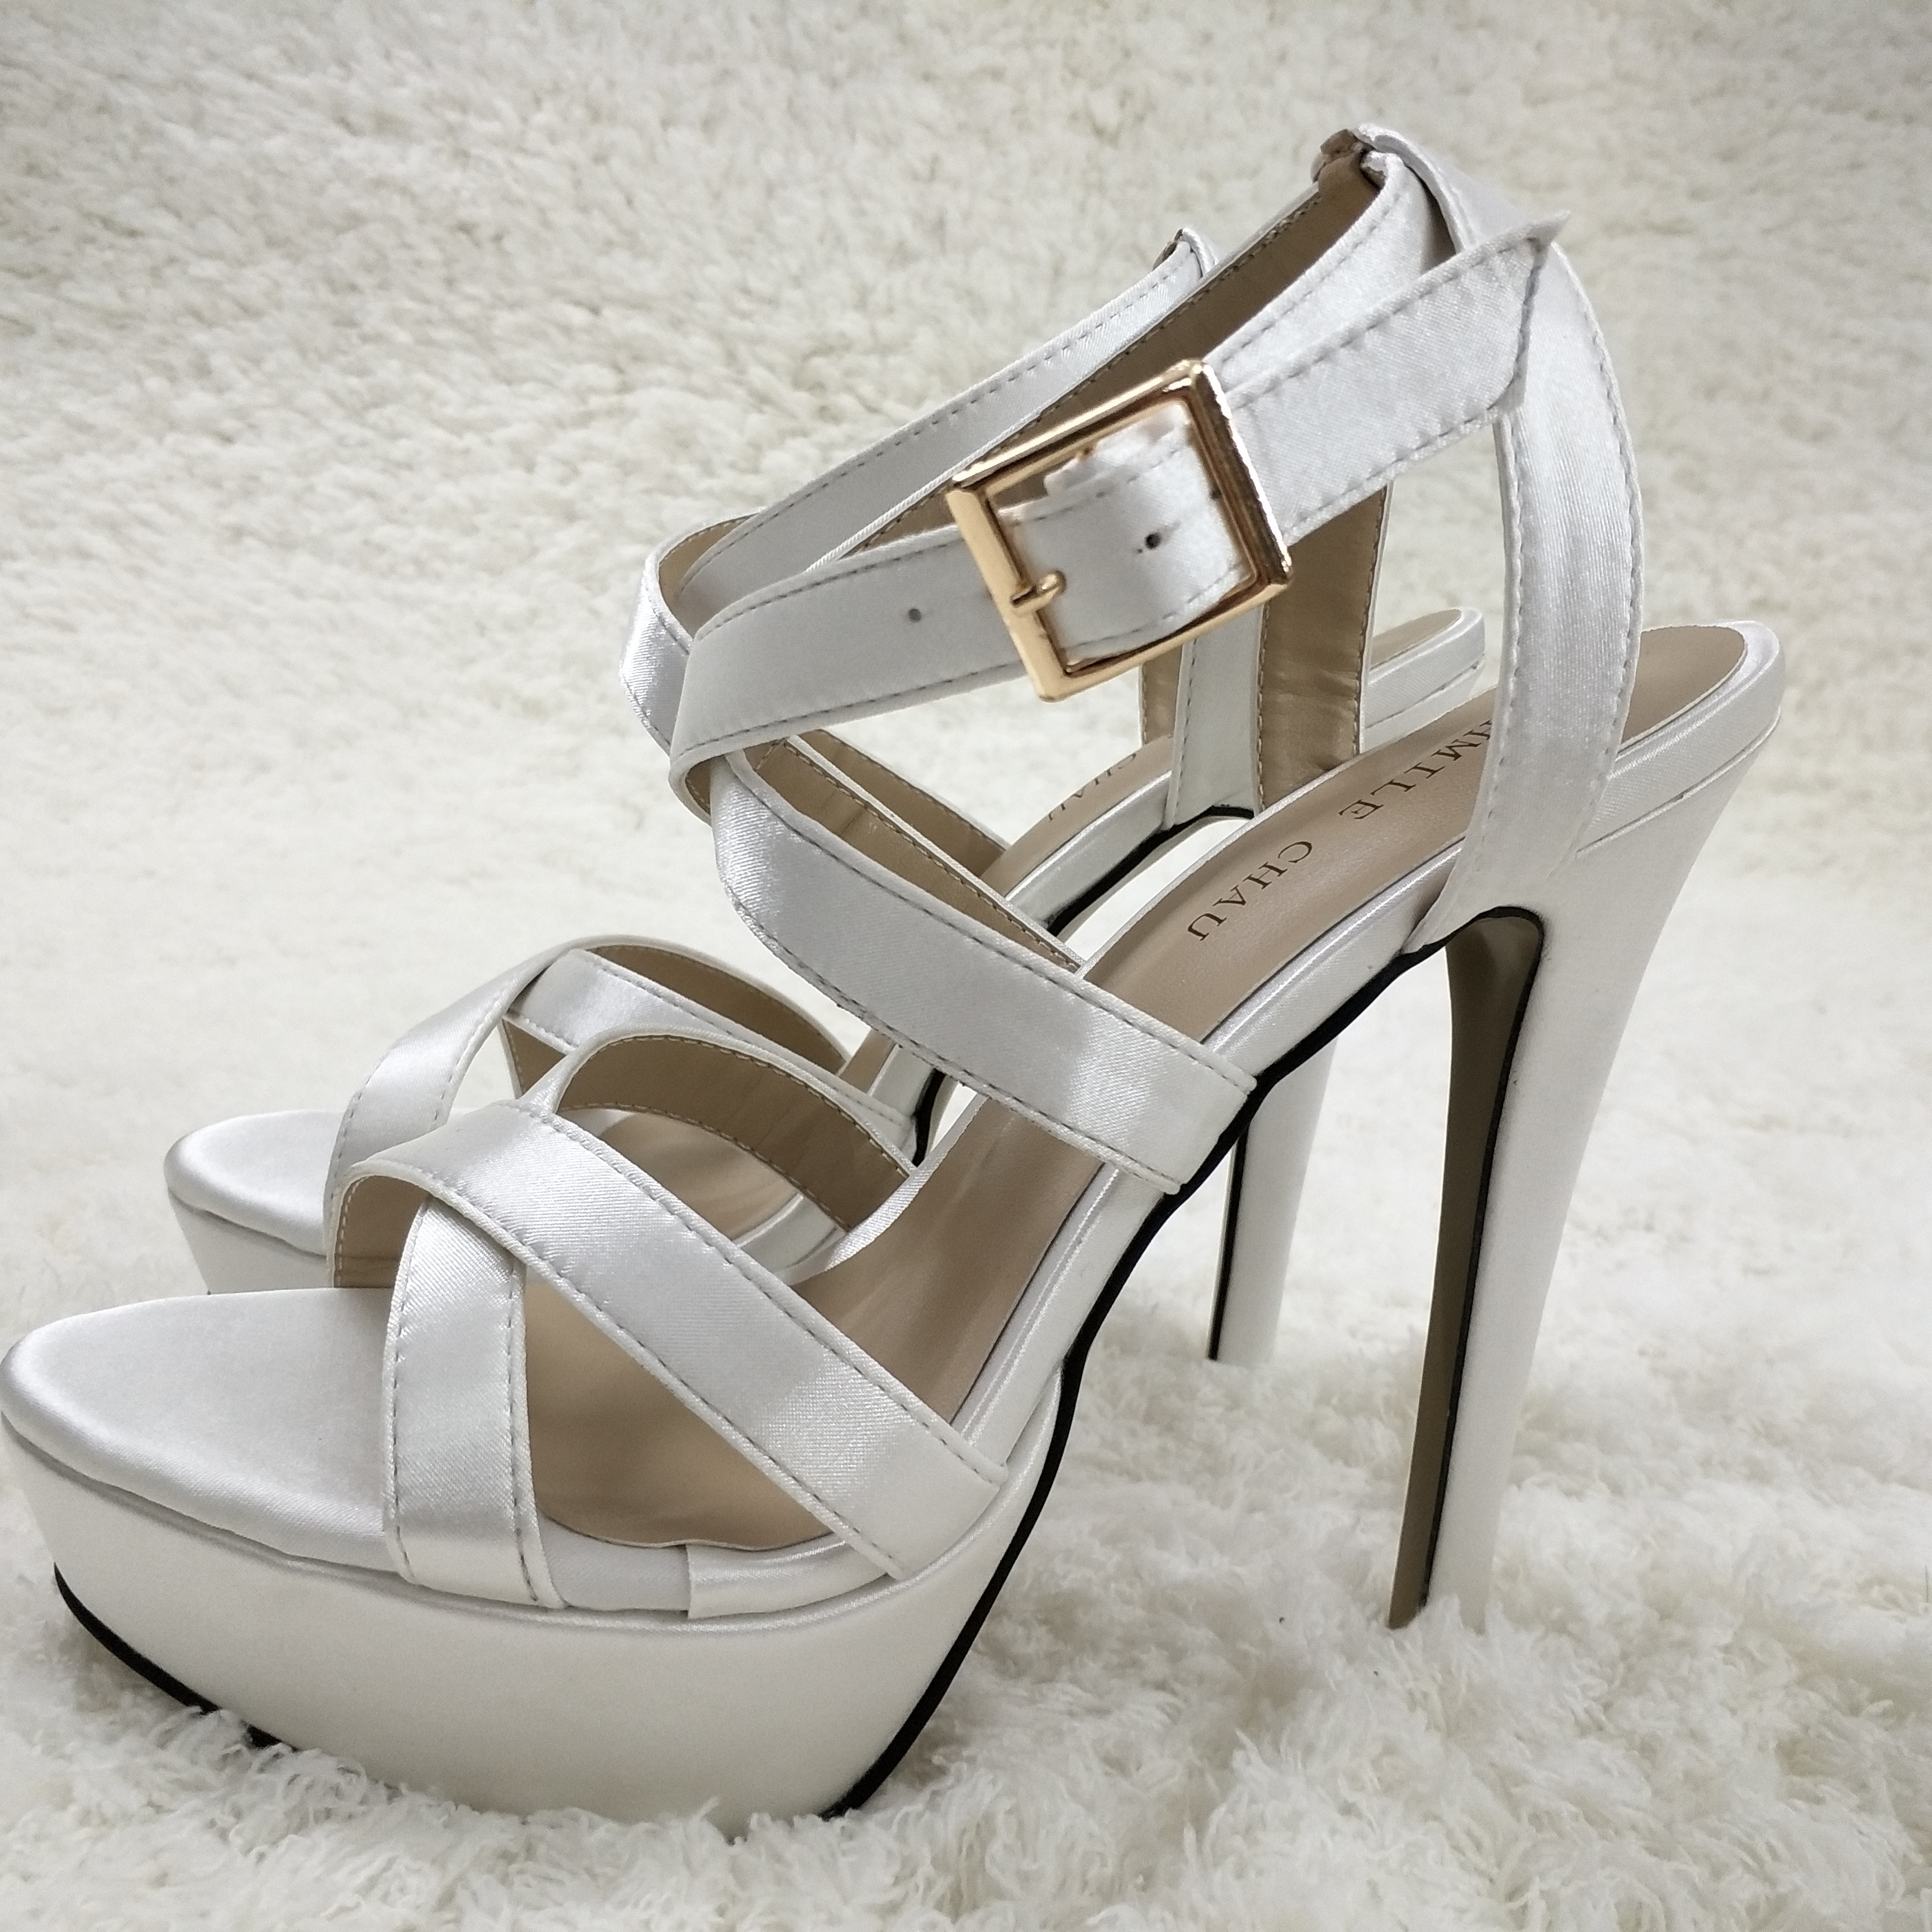 Mulher stiletto fino salto alto sandália sexy tornozelo cinta aberta plataforma marfim cetim moda vestido festa senhora sapato 3463sl-a